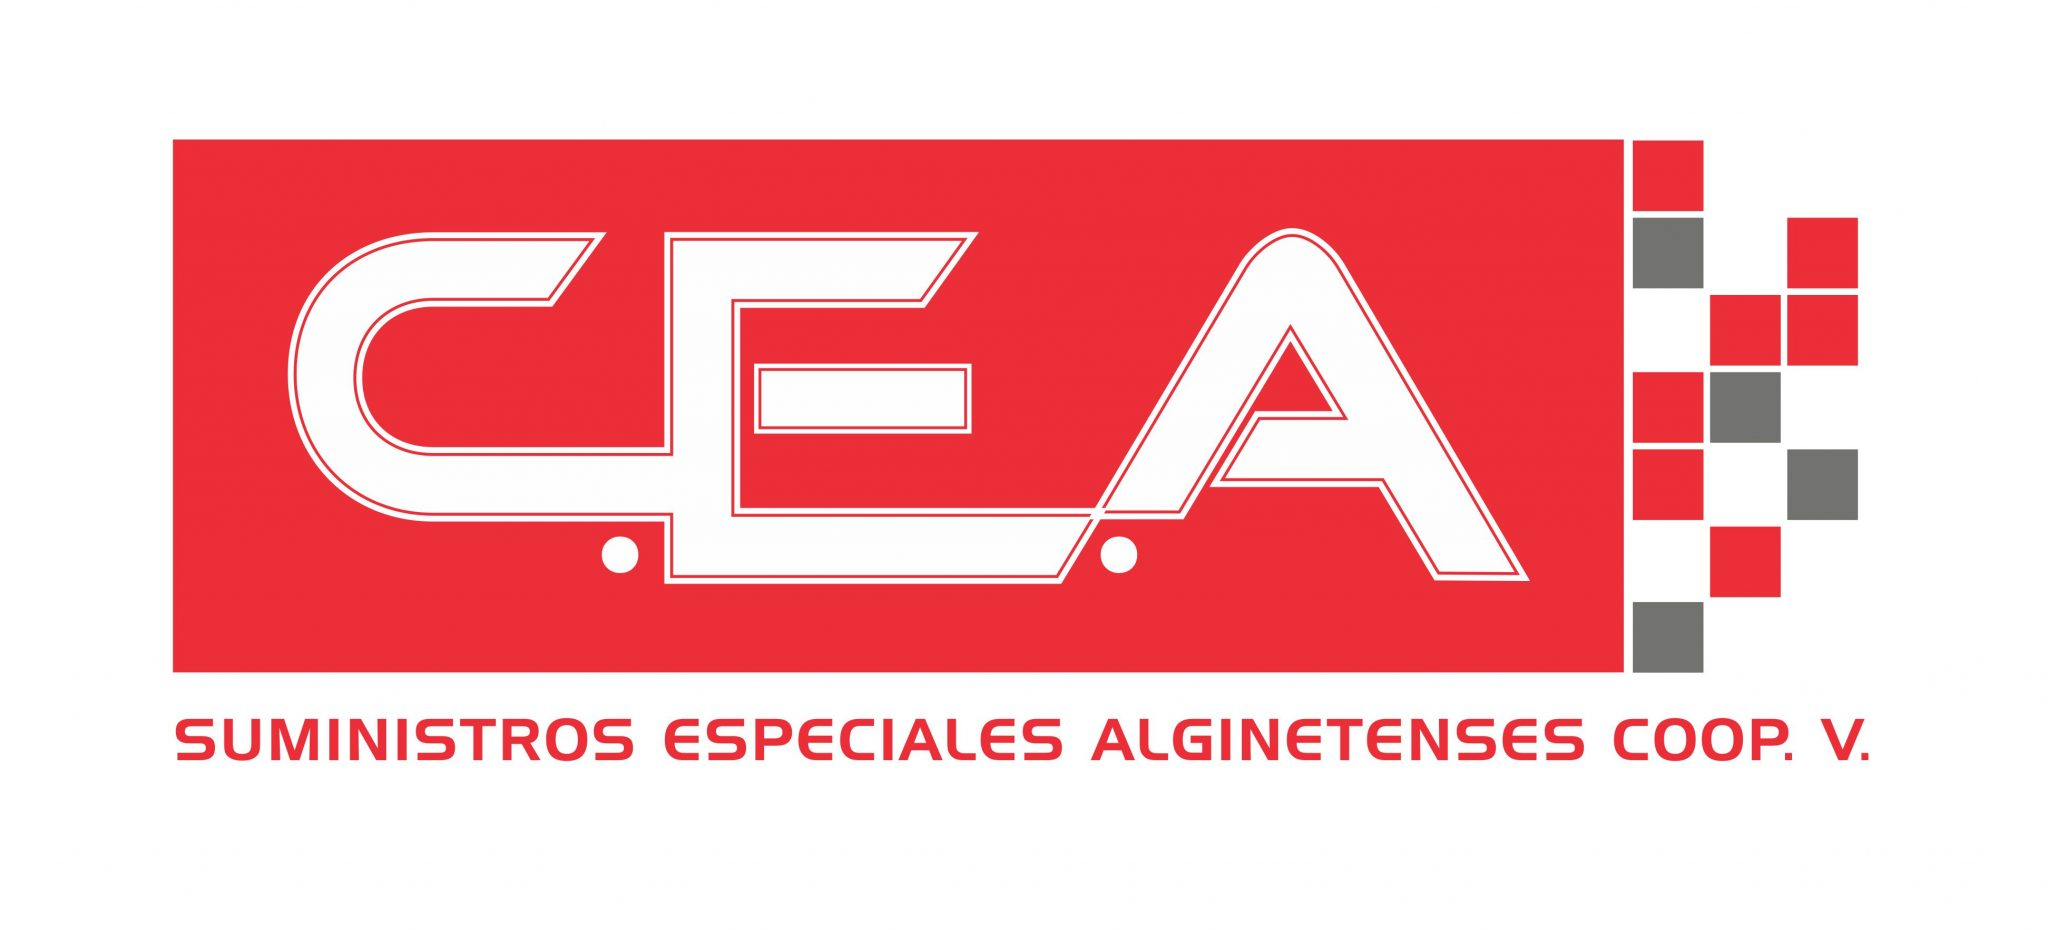 Suministros Especiales Alginetensenses COOP. V.